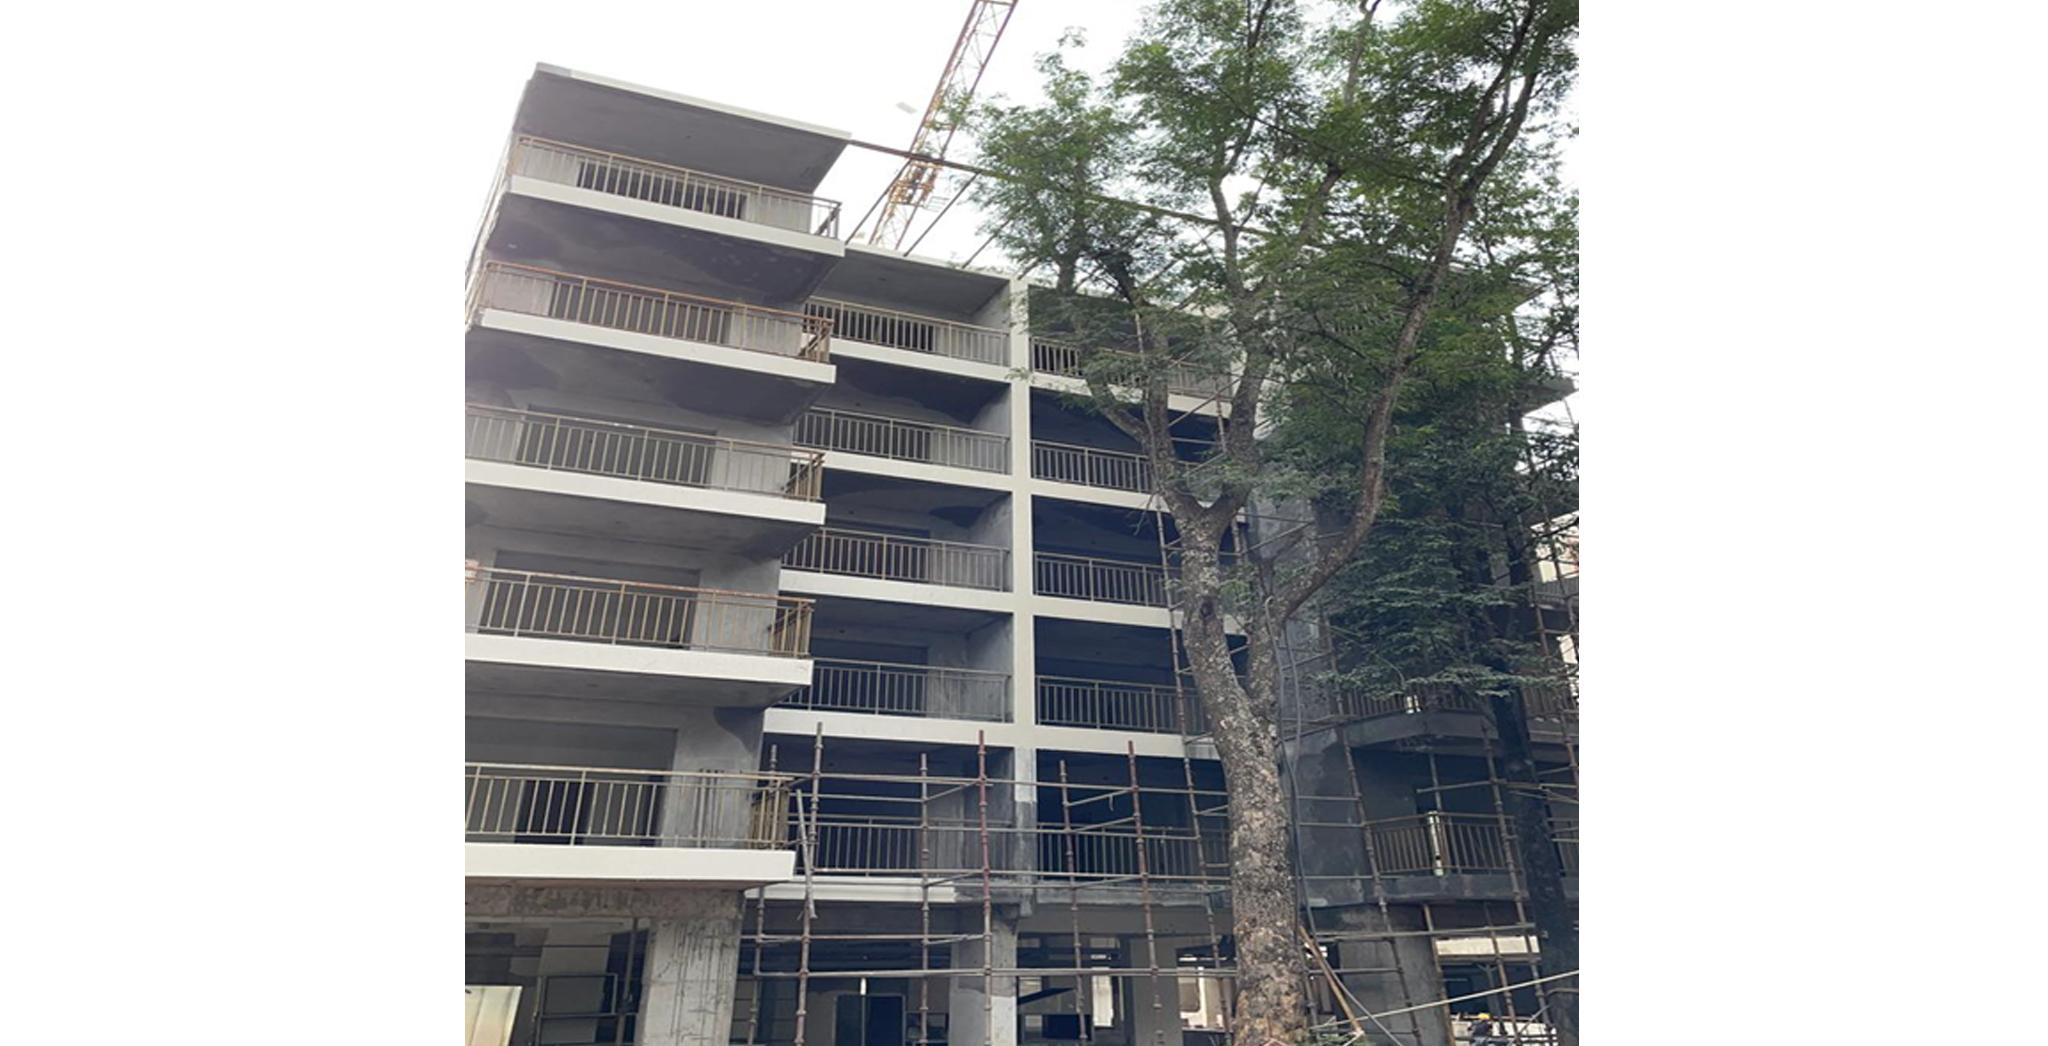 Aug 2021 - S Block: East Elevation External Painting work in progress